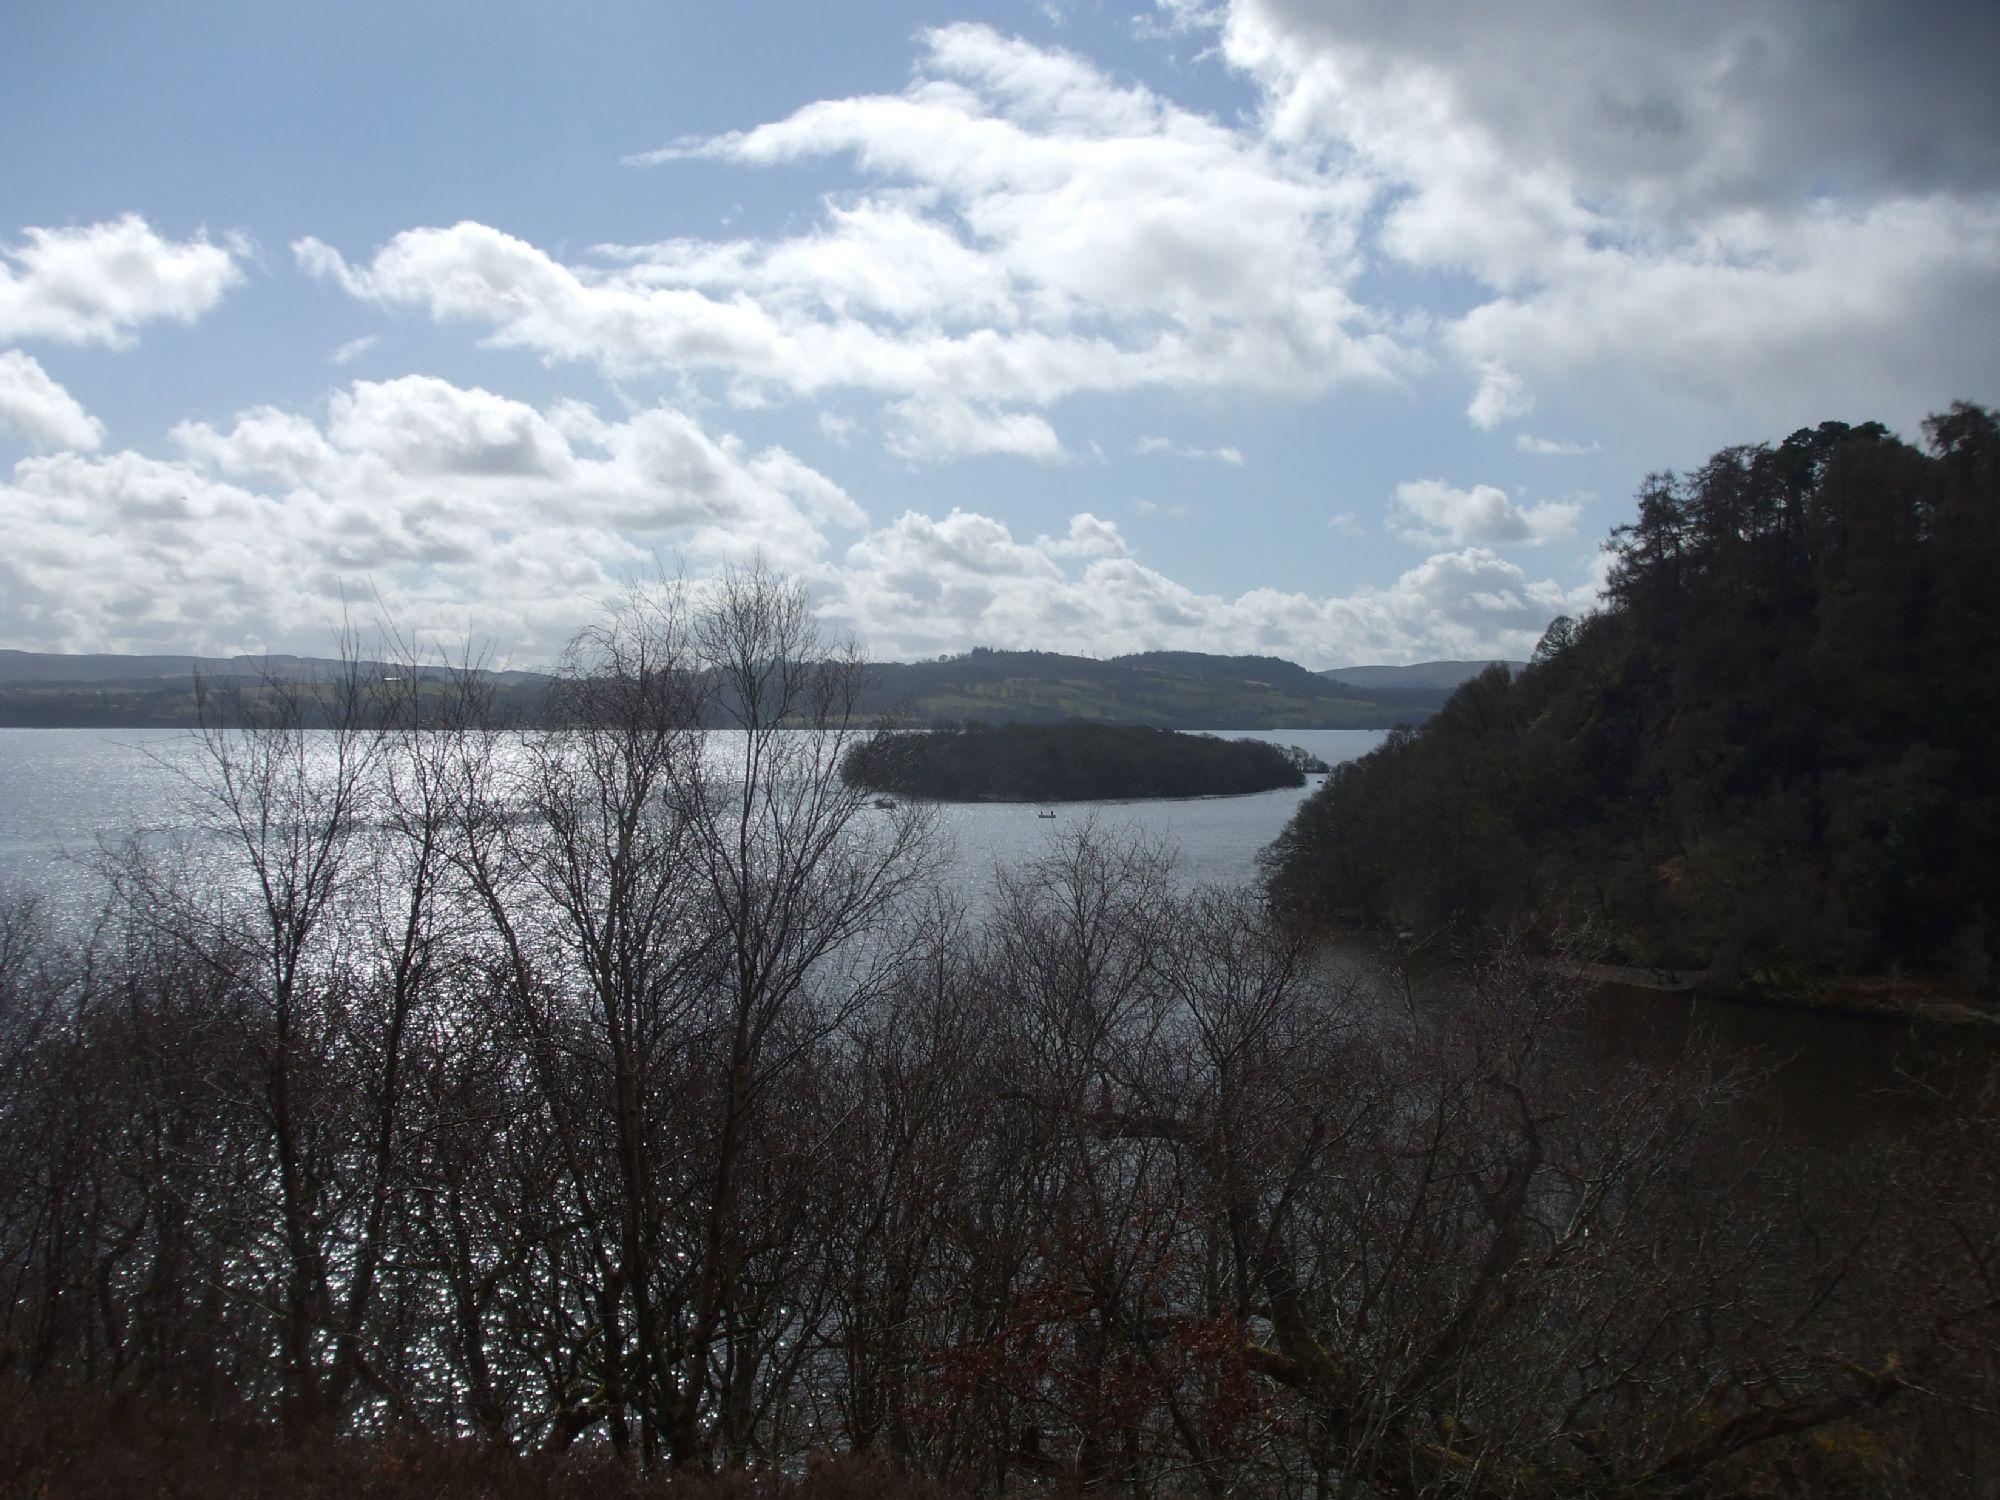 Climbed to appreciate Loch